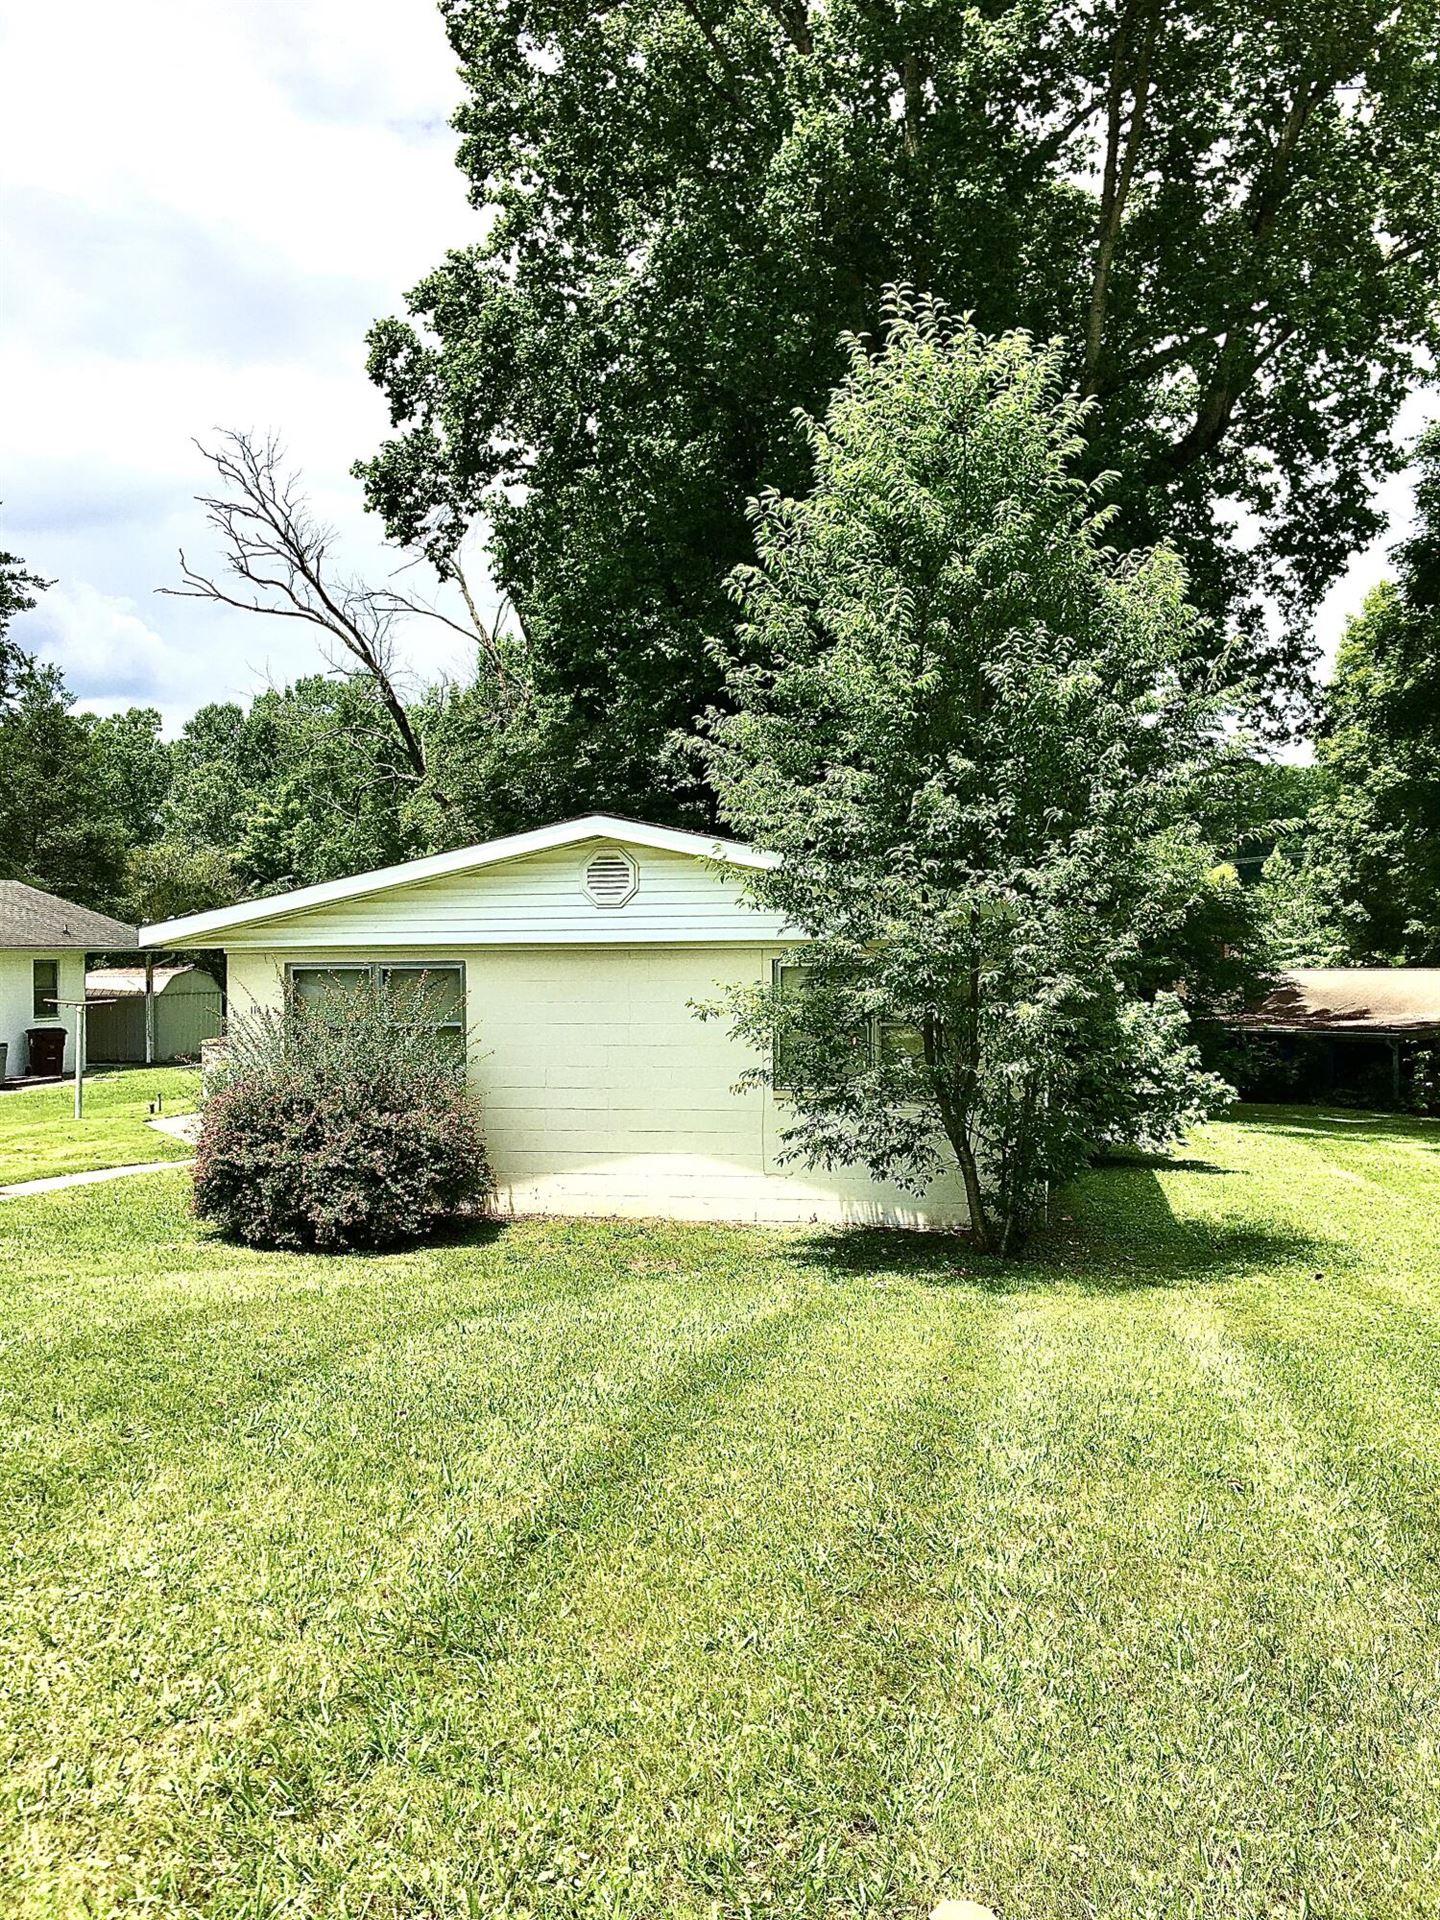 Photo of 114 Park Lane, Oak Ridge, TN 37830 (MLS # 1161513)